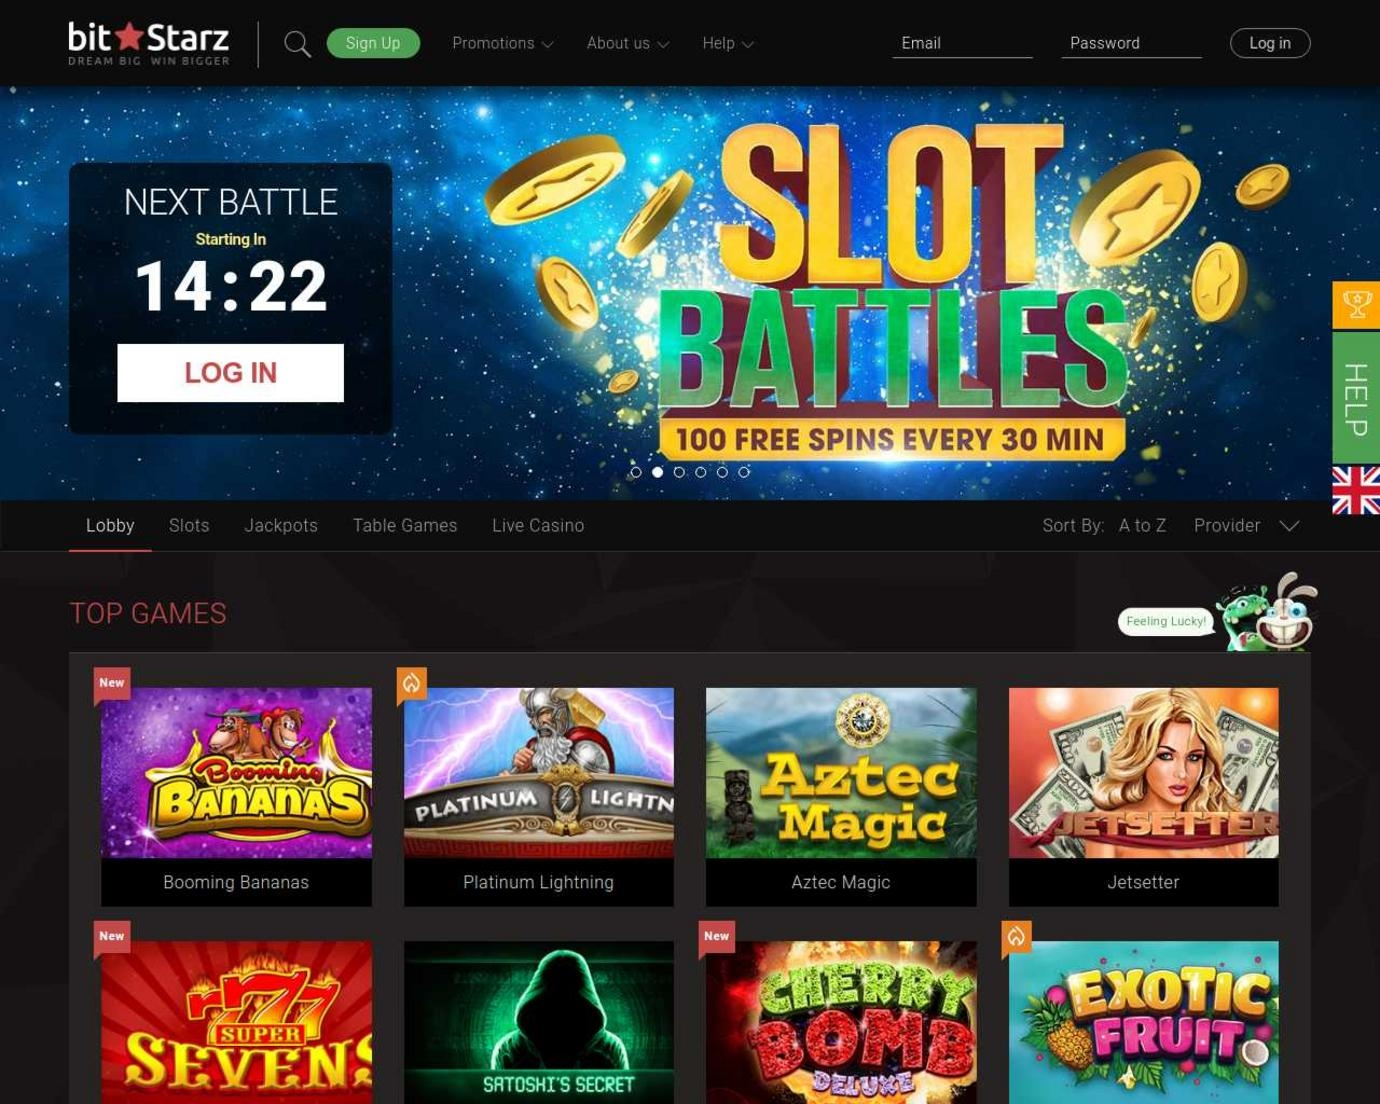 Big 5 casino 5 free spins